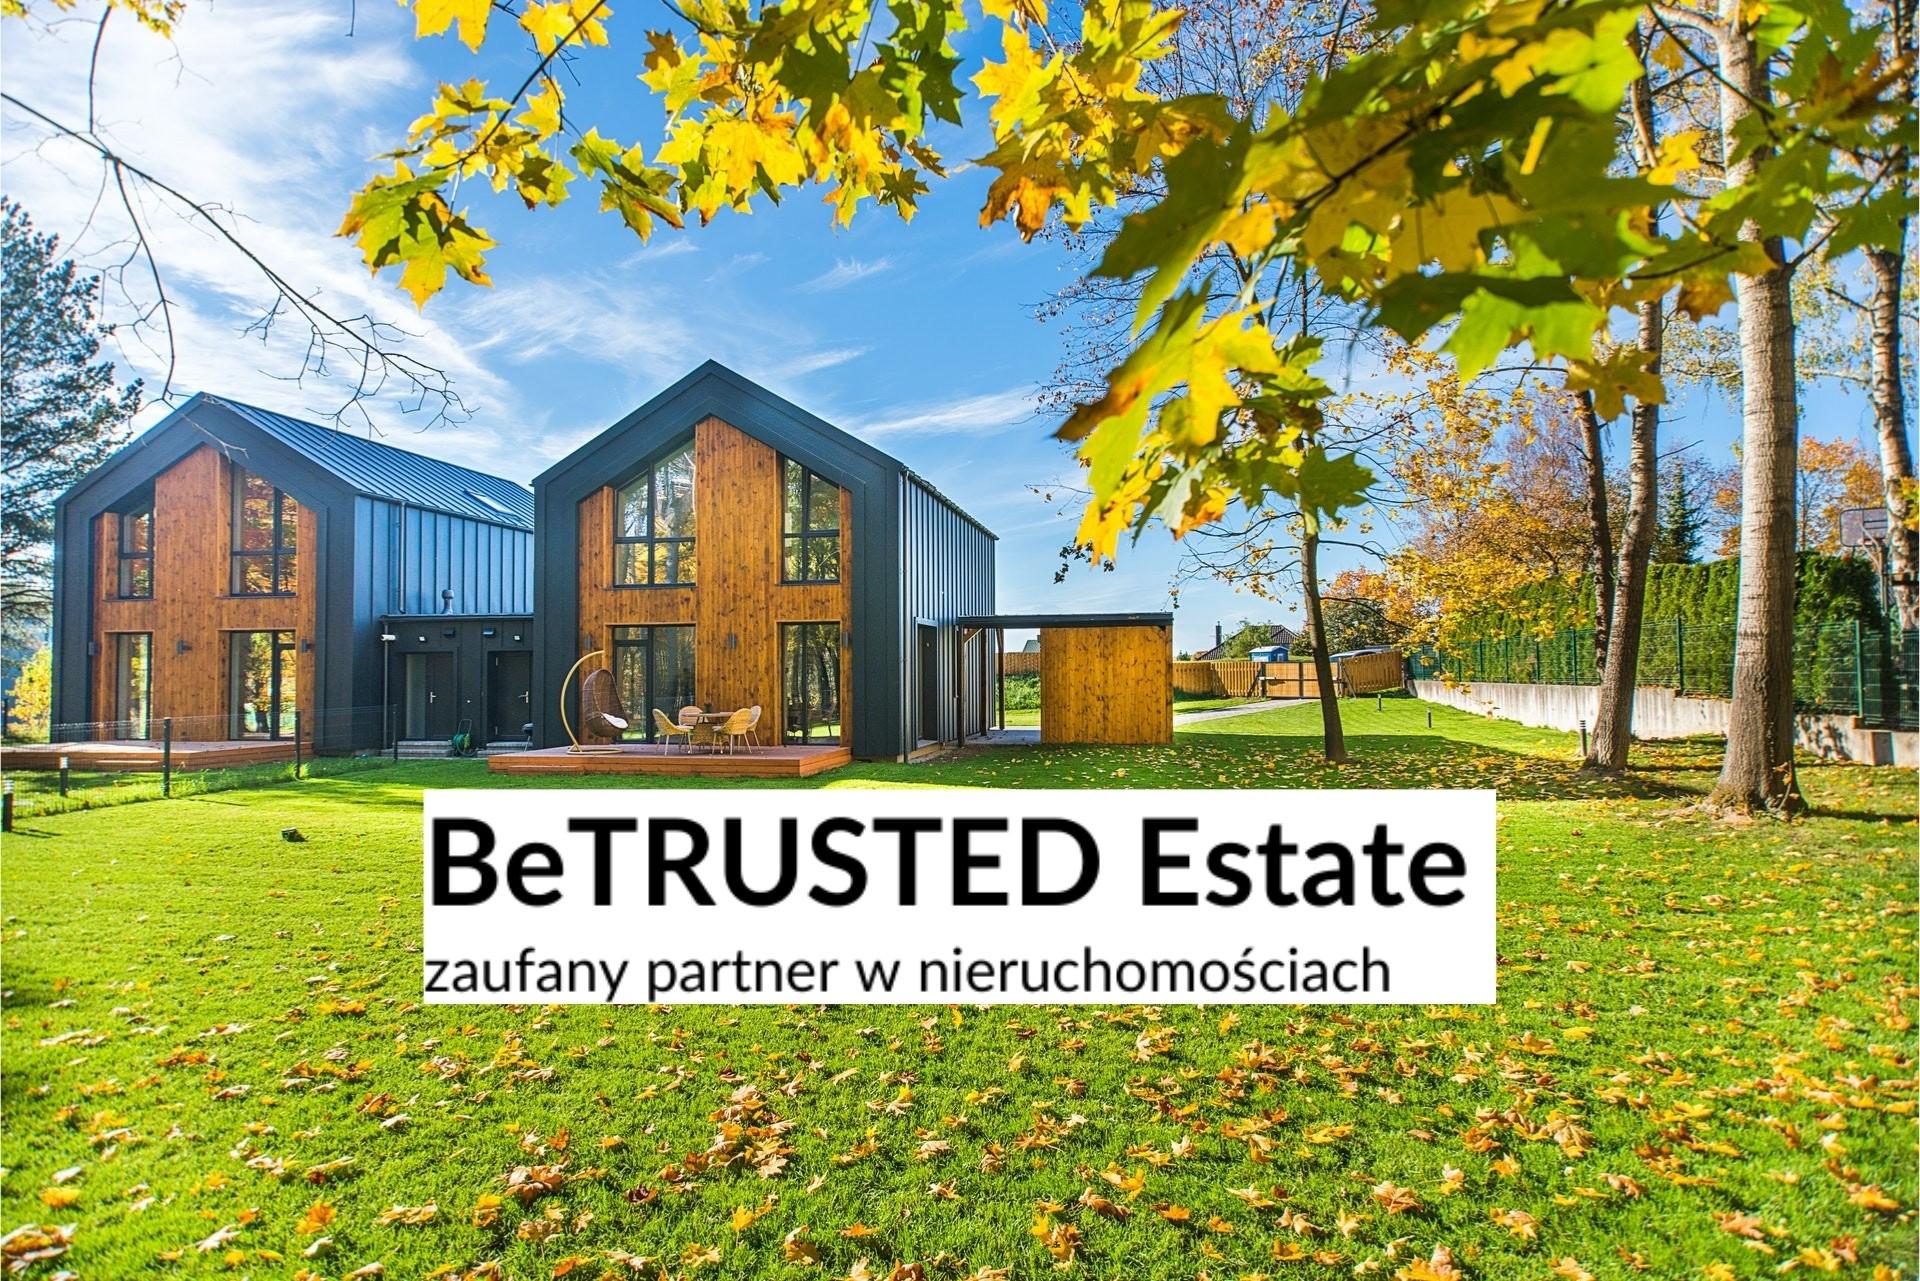 BeTrusted Estate – zaufany partner w nieruchomościach